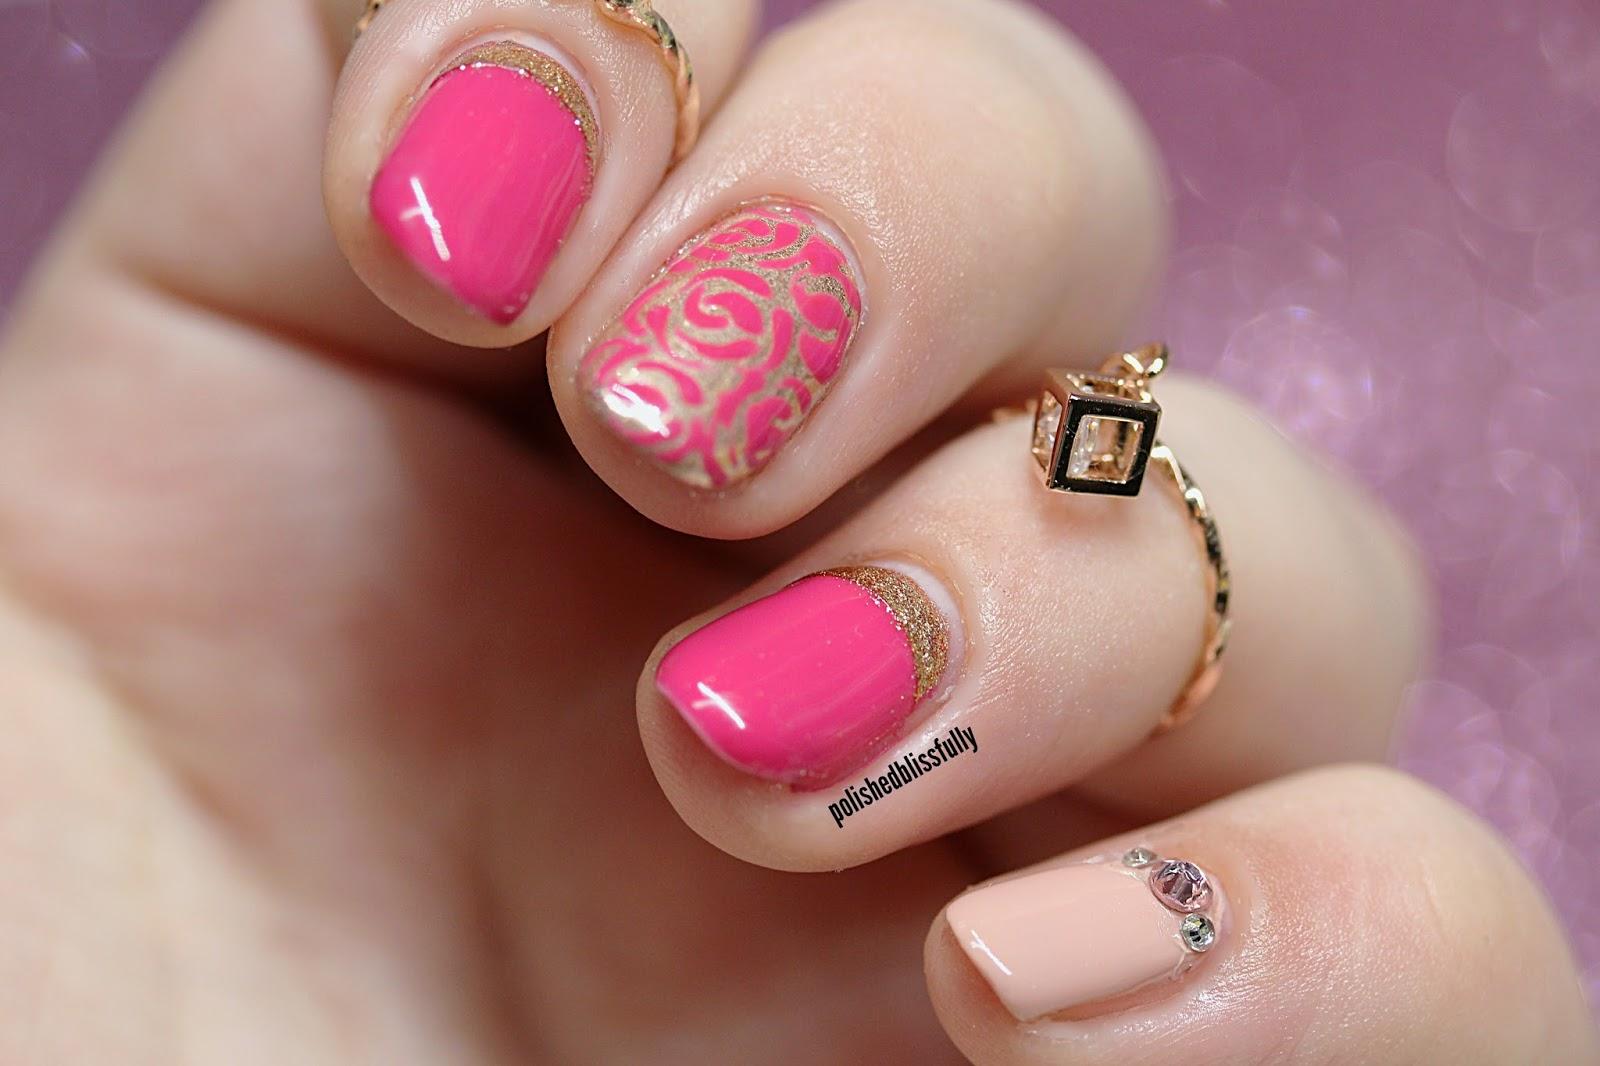 Polishedblissfully Rose Gold Floral Gel Nail Design